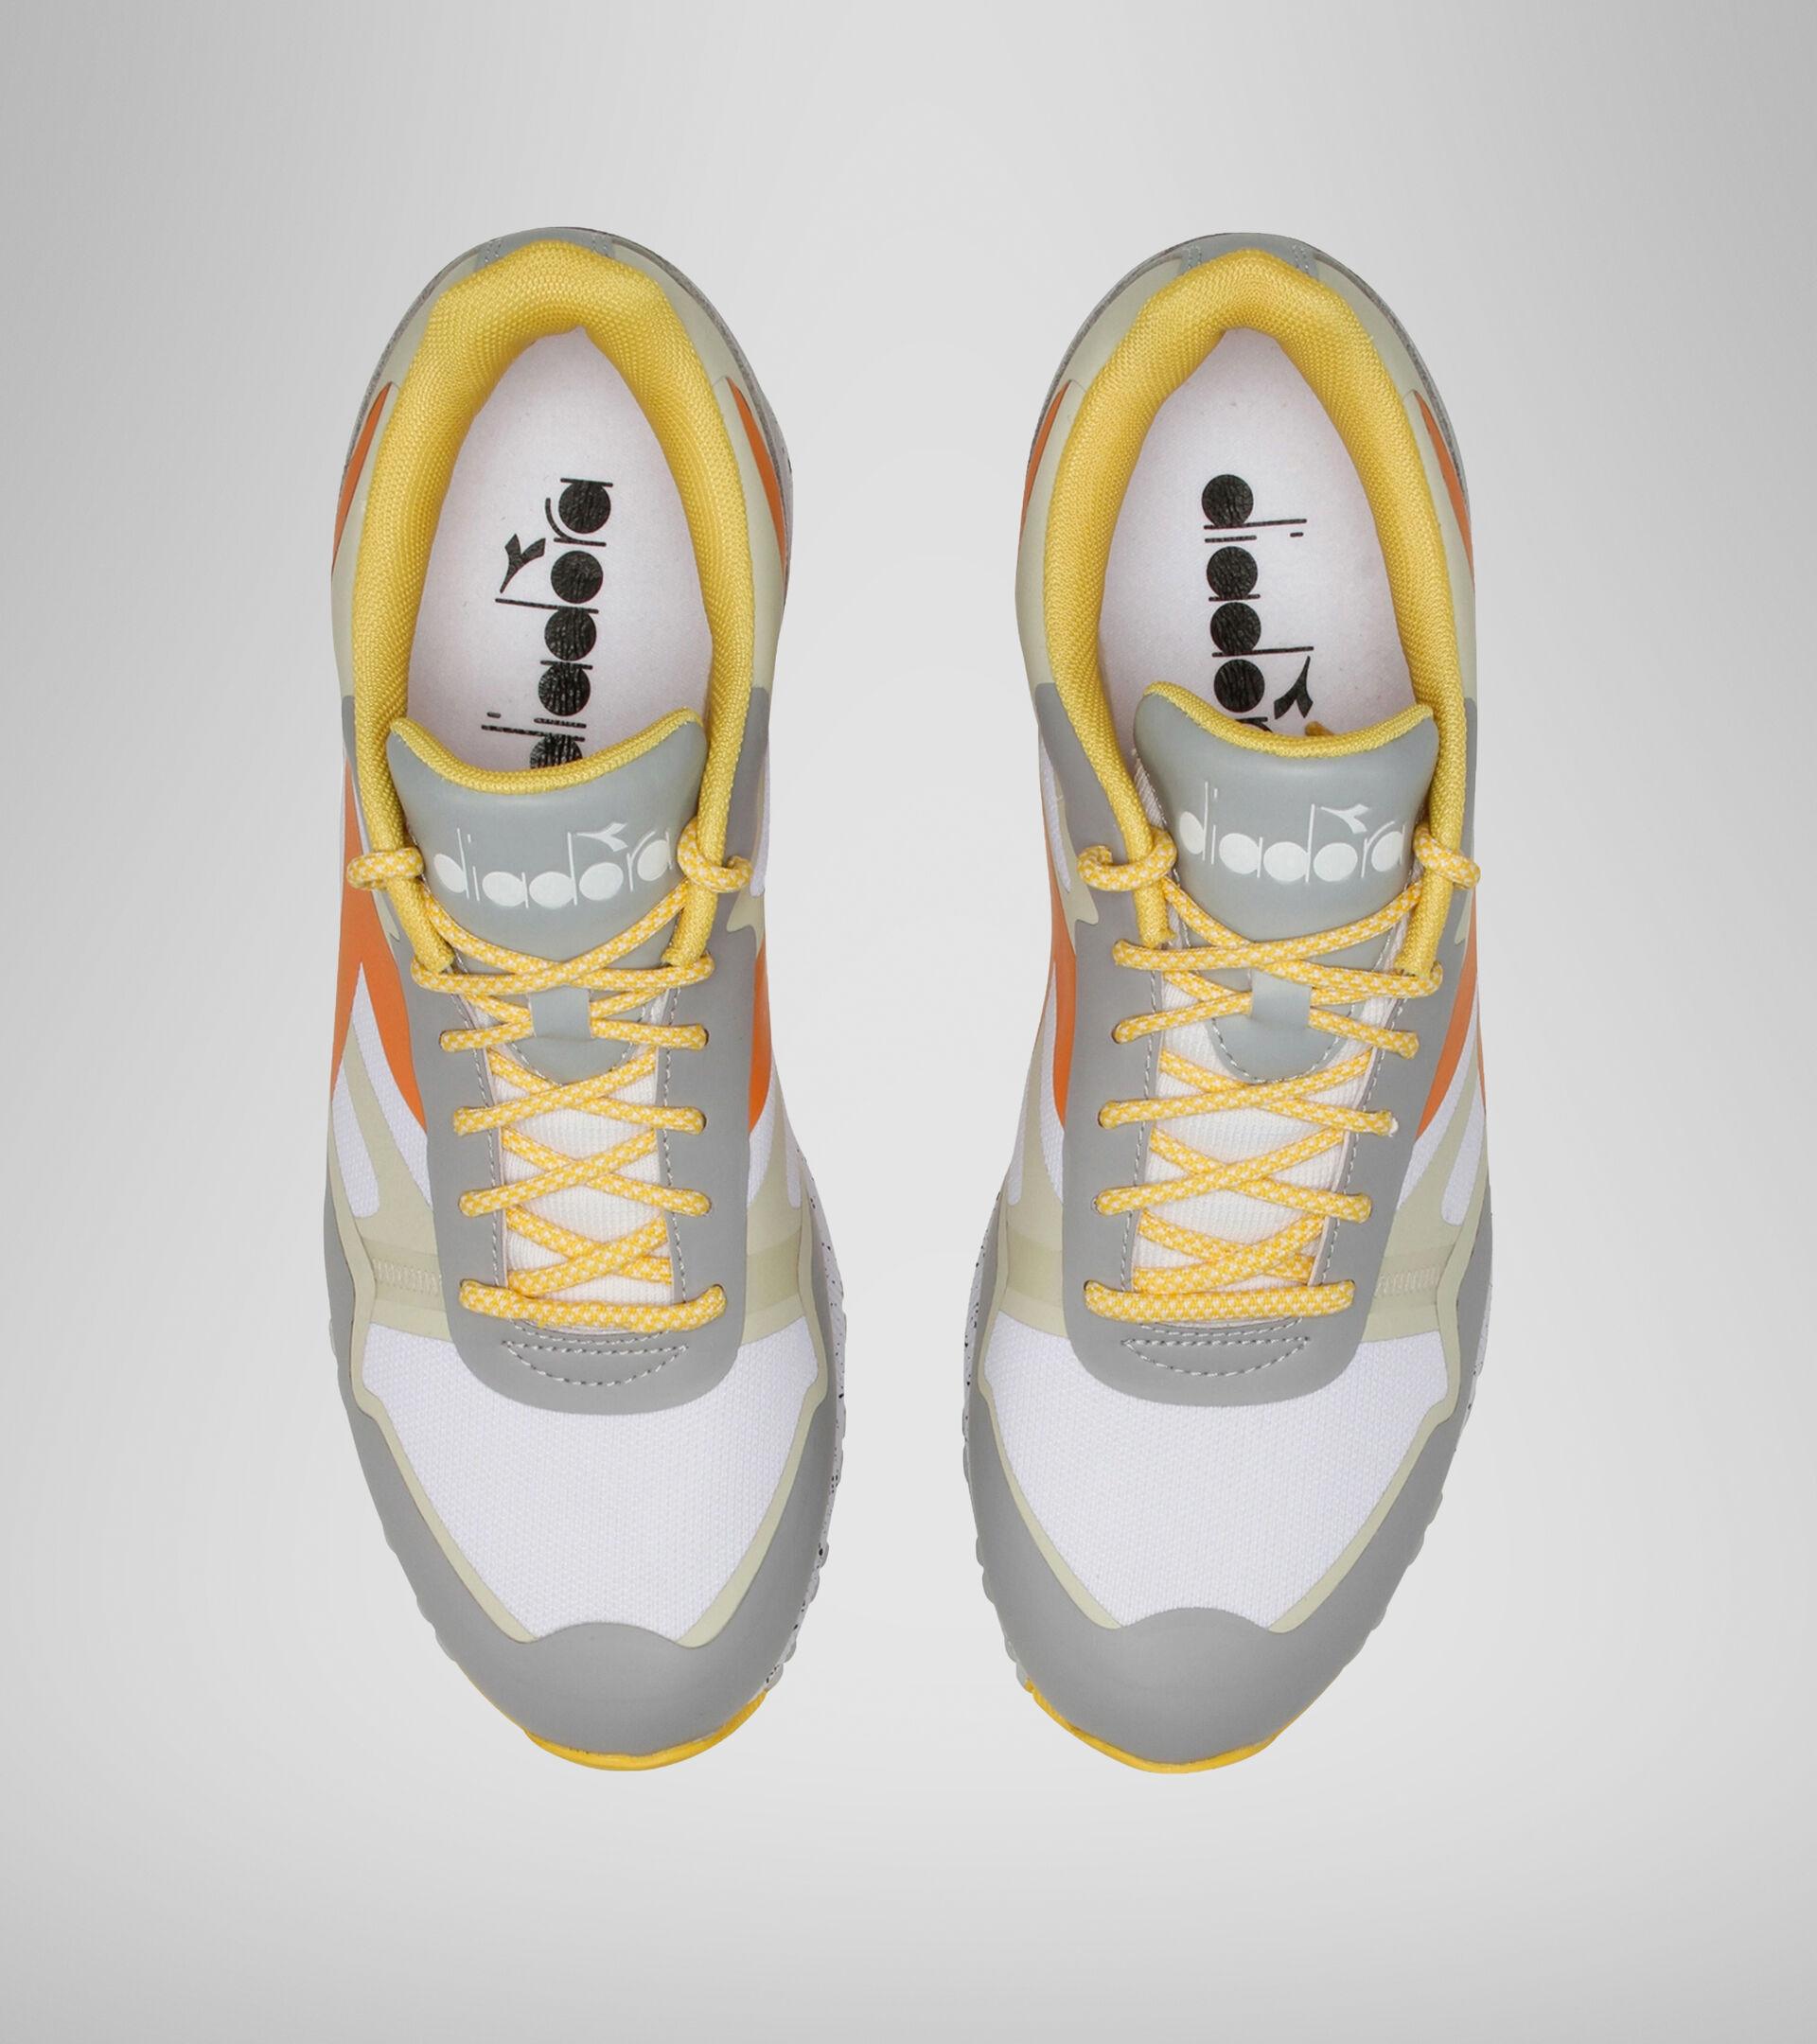 Footwear Sportswear UOMO N902 OUTDOOR SLEET/OYSTER WHITE/RUSSET ORAN Diadora